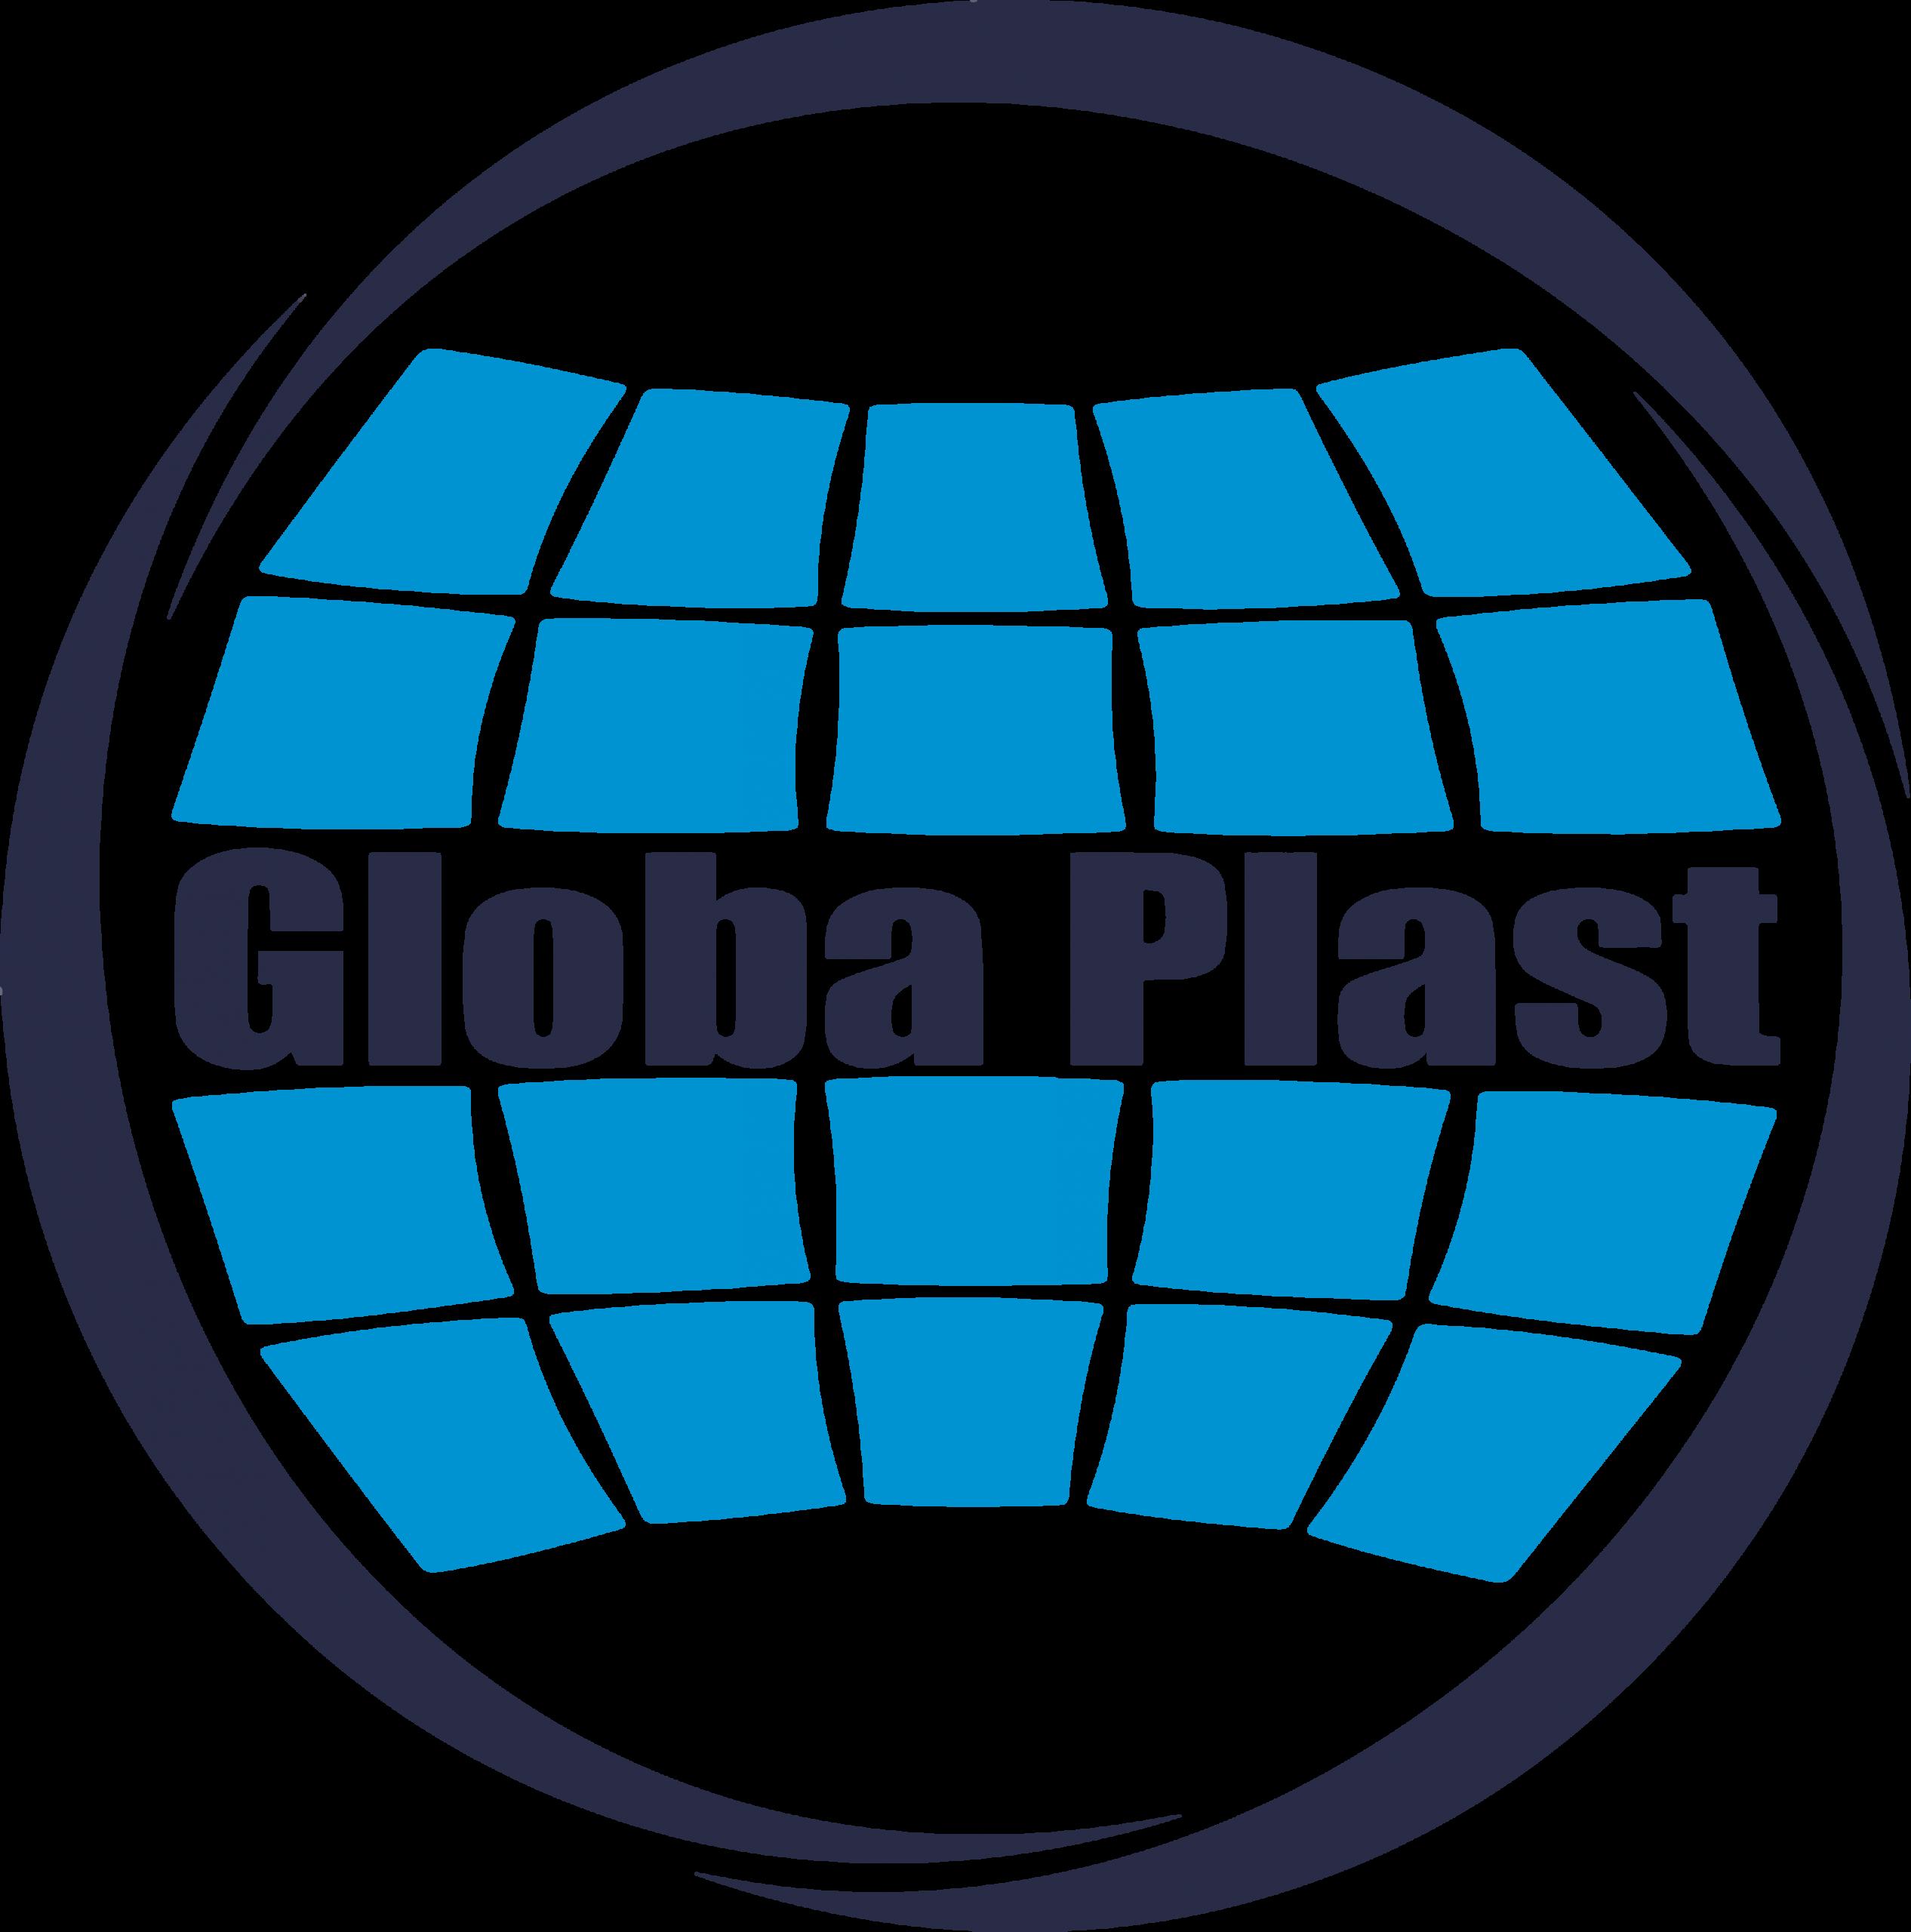 Globa Plast